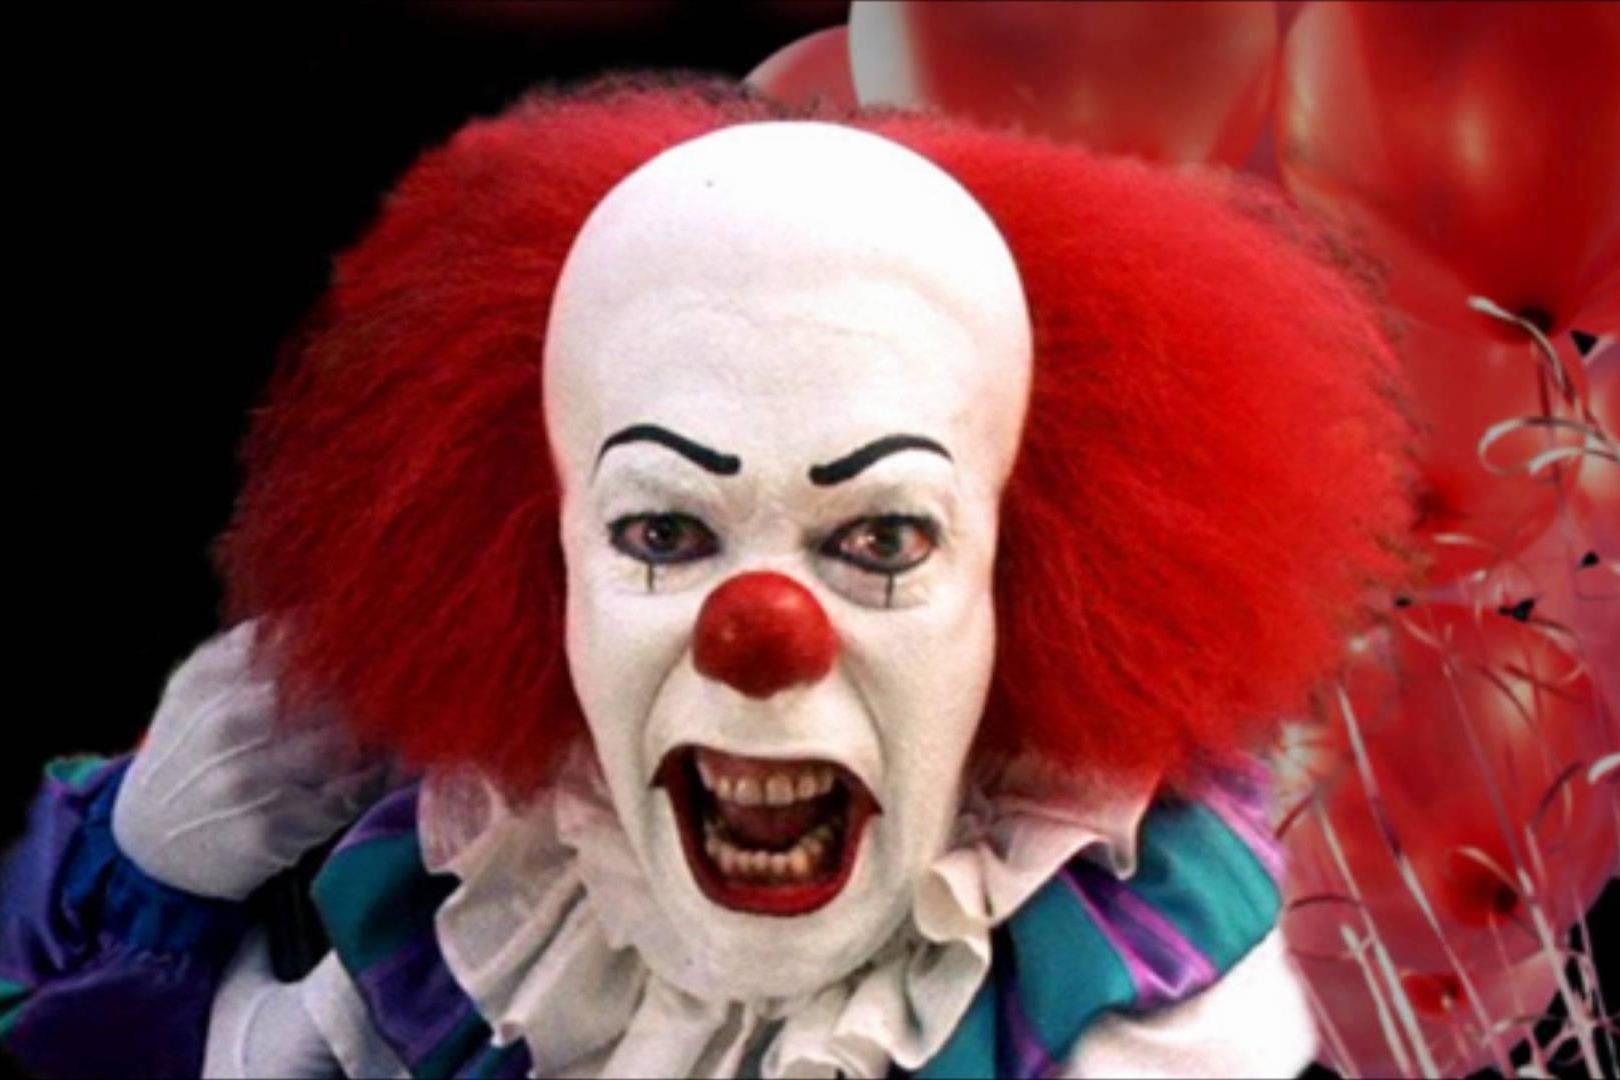 Singles interested in insane clown posse